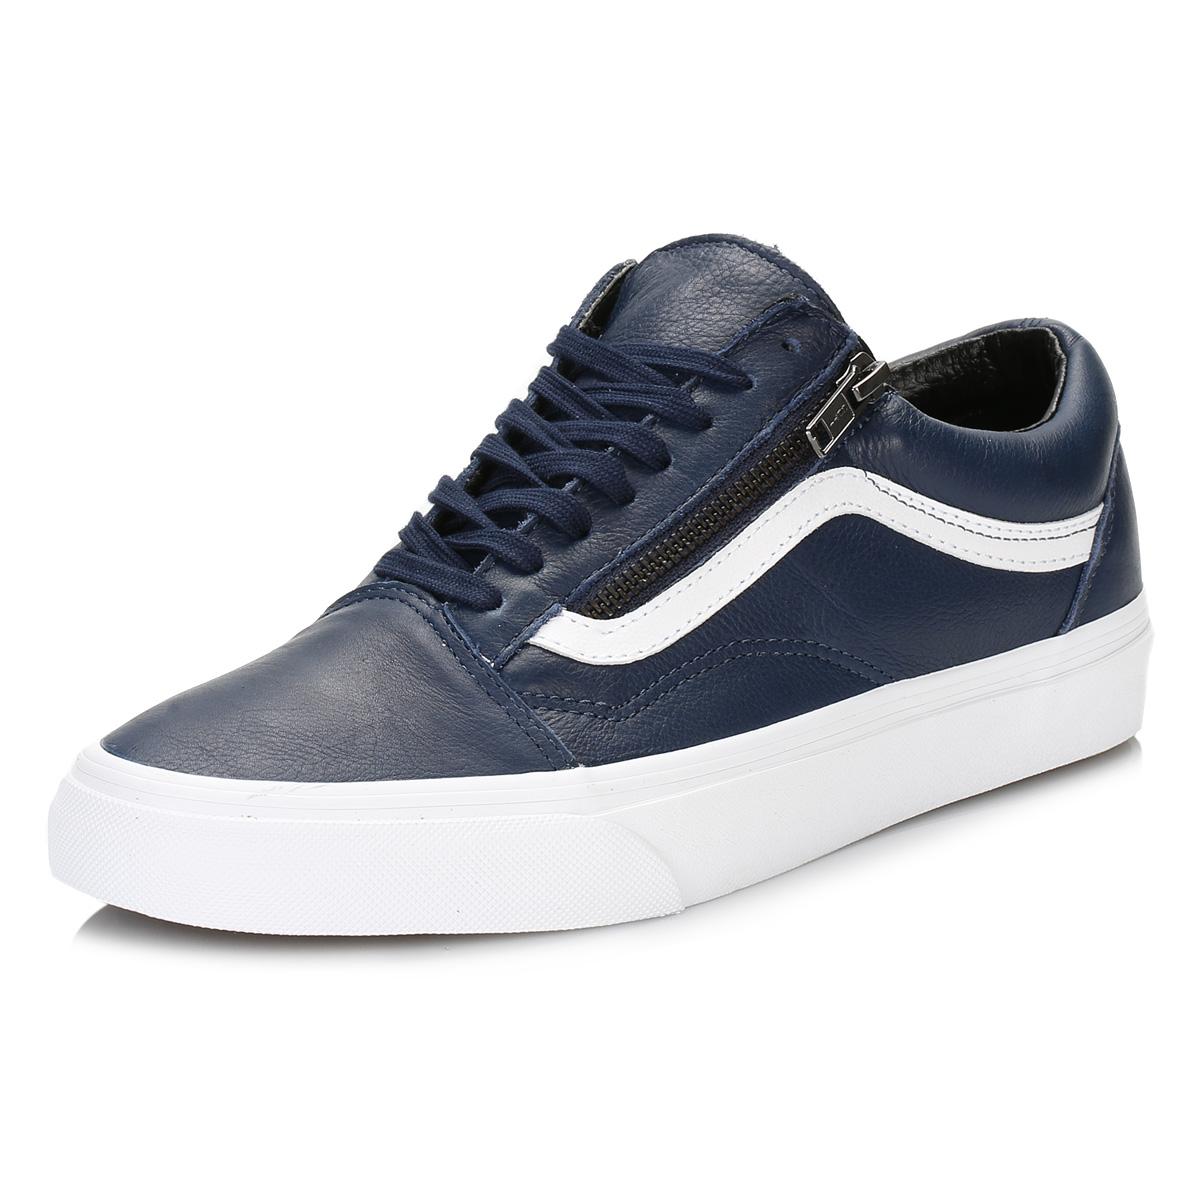 ab1e0286b12 Buy mens blue vans